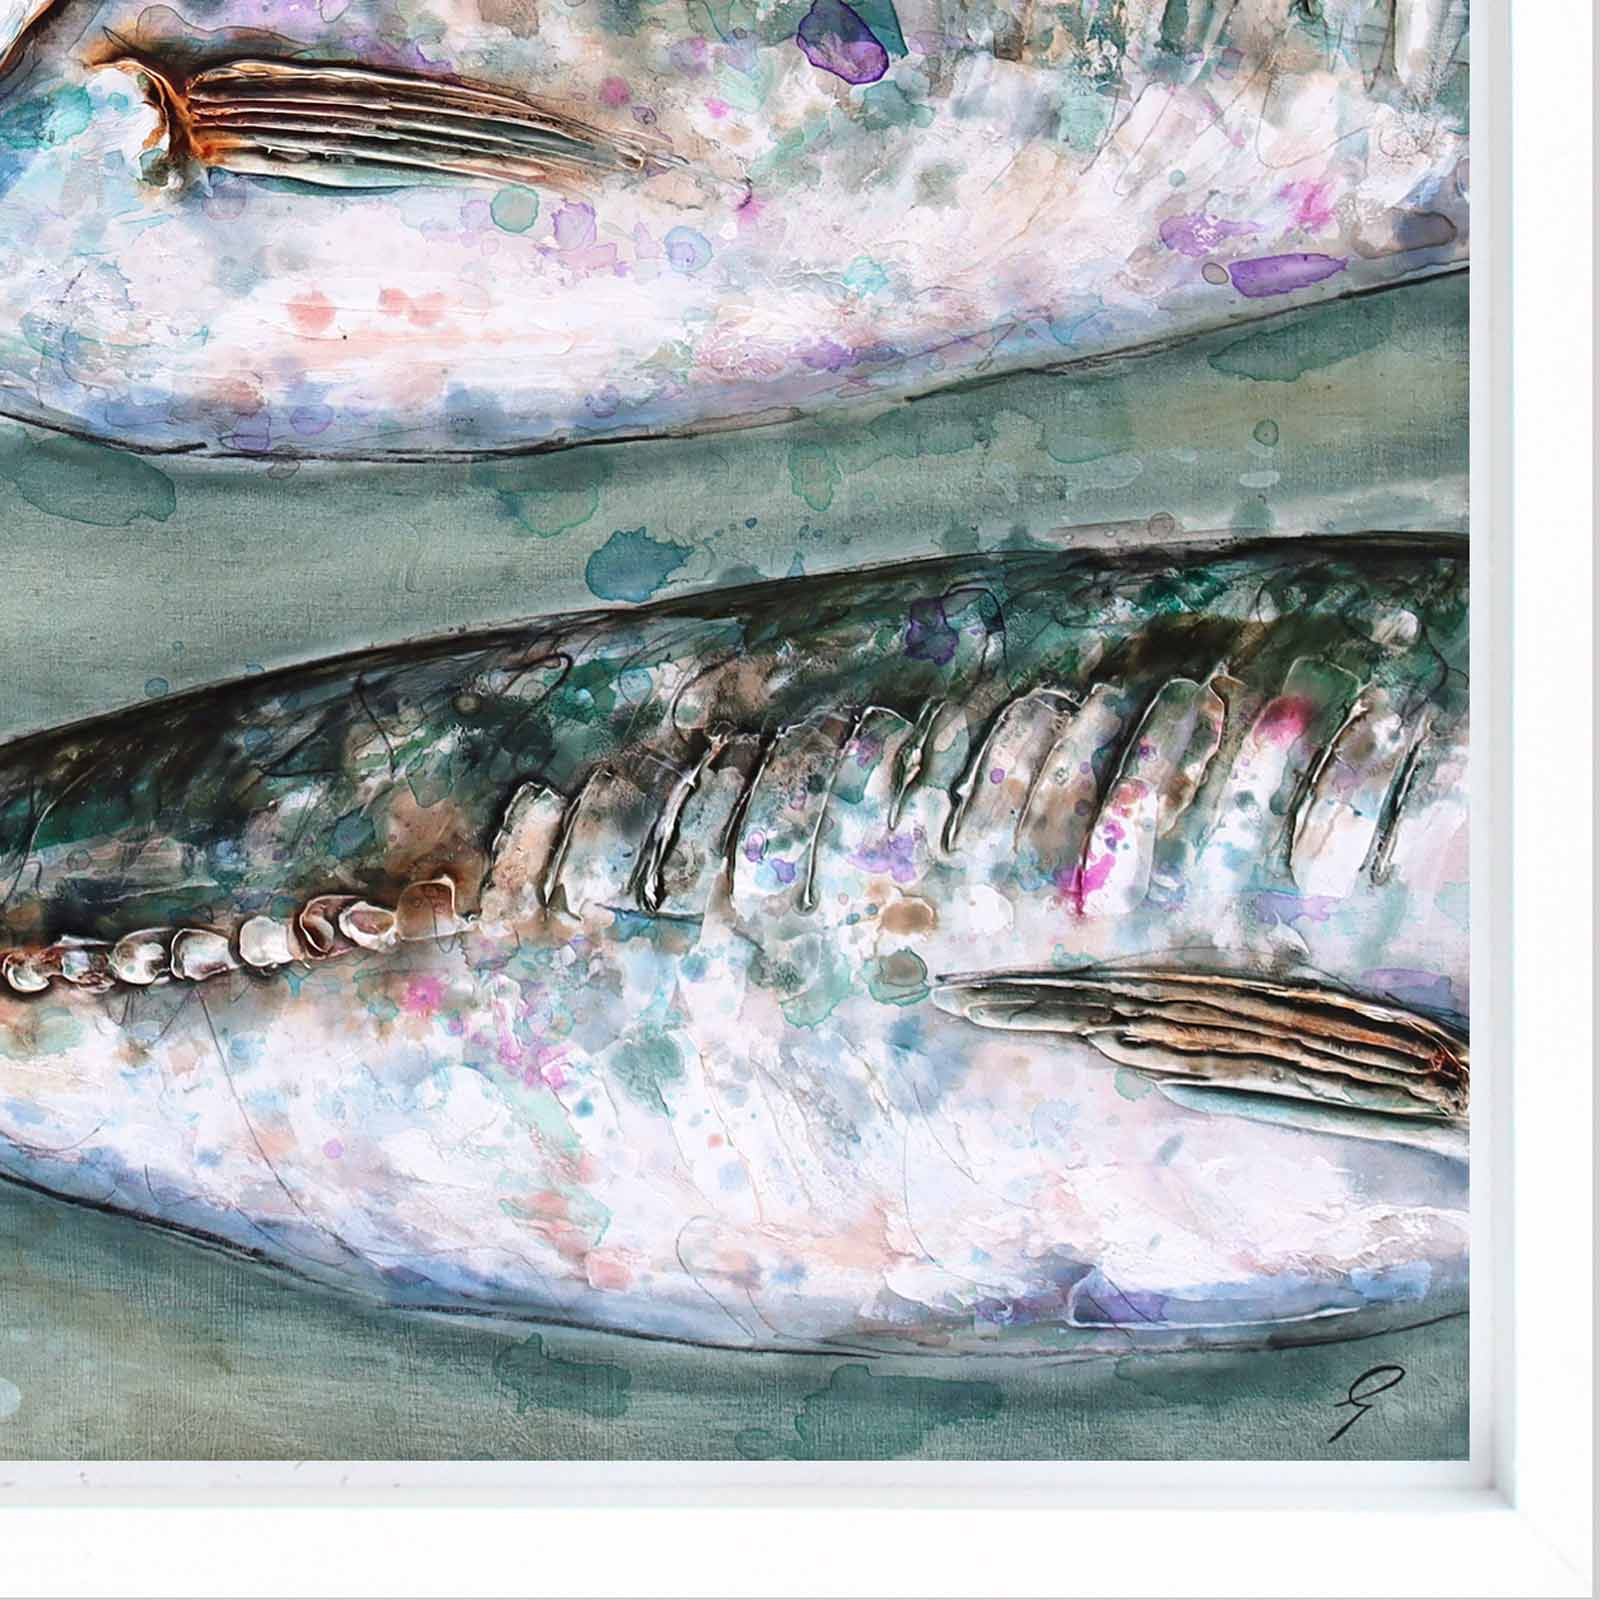 Three Large Mackerel Scad